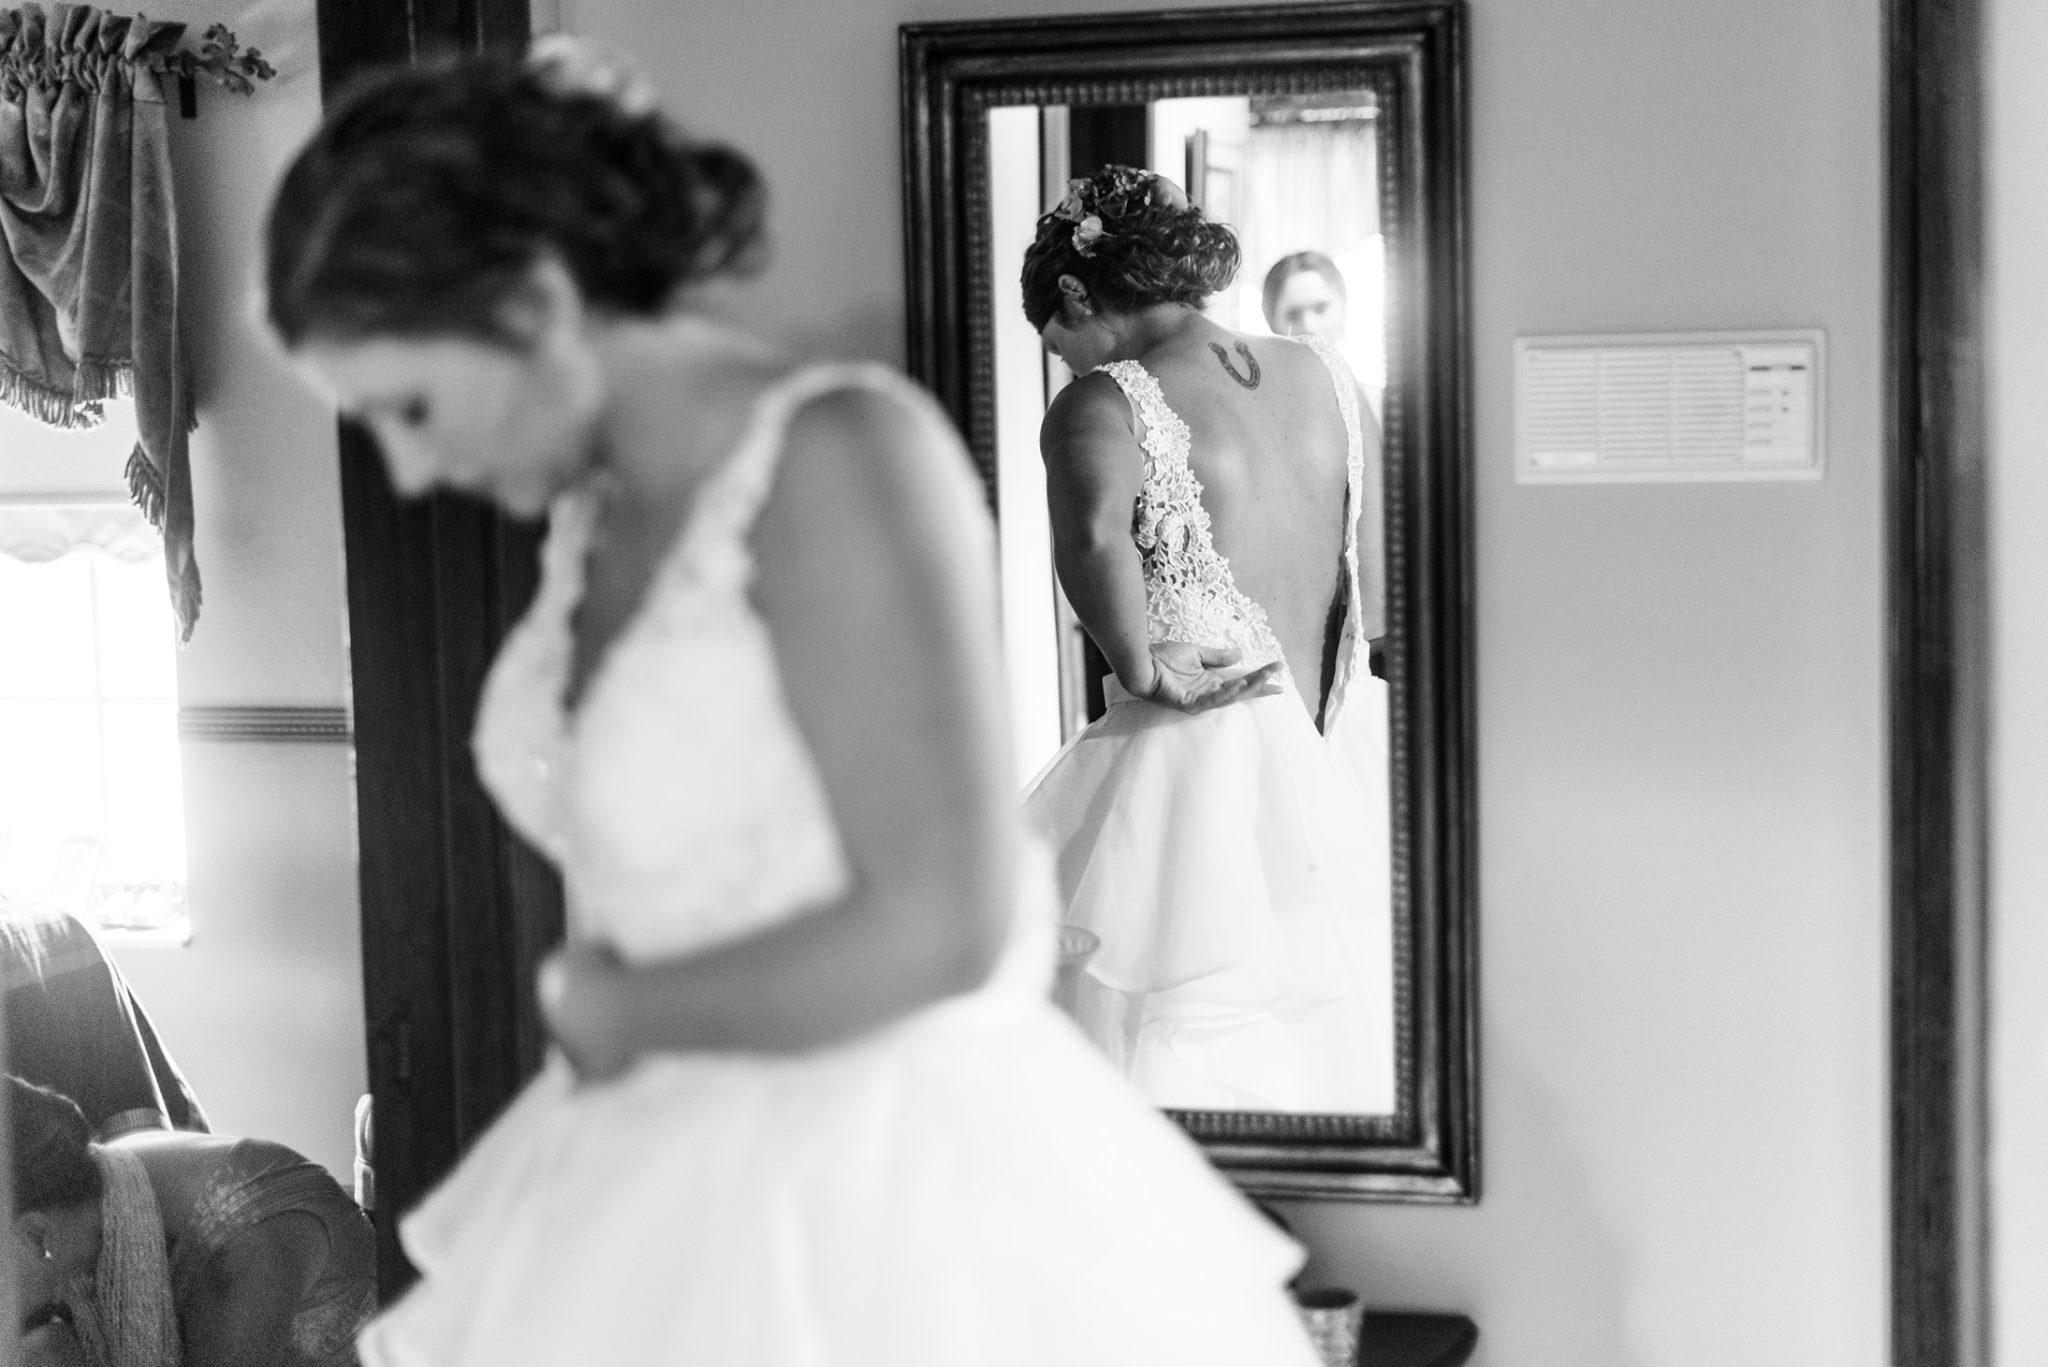 pennsylvania-backyard-wedding-love-diy-bohemian-romantic-colorful-0007.jpg